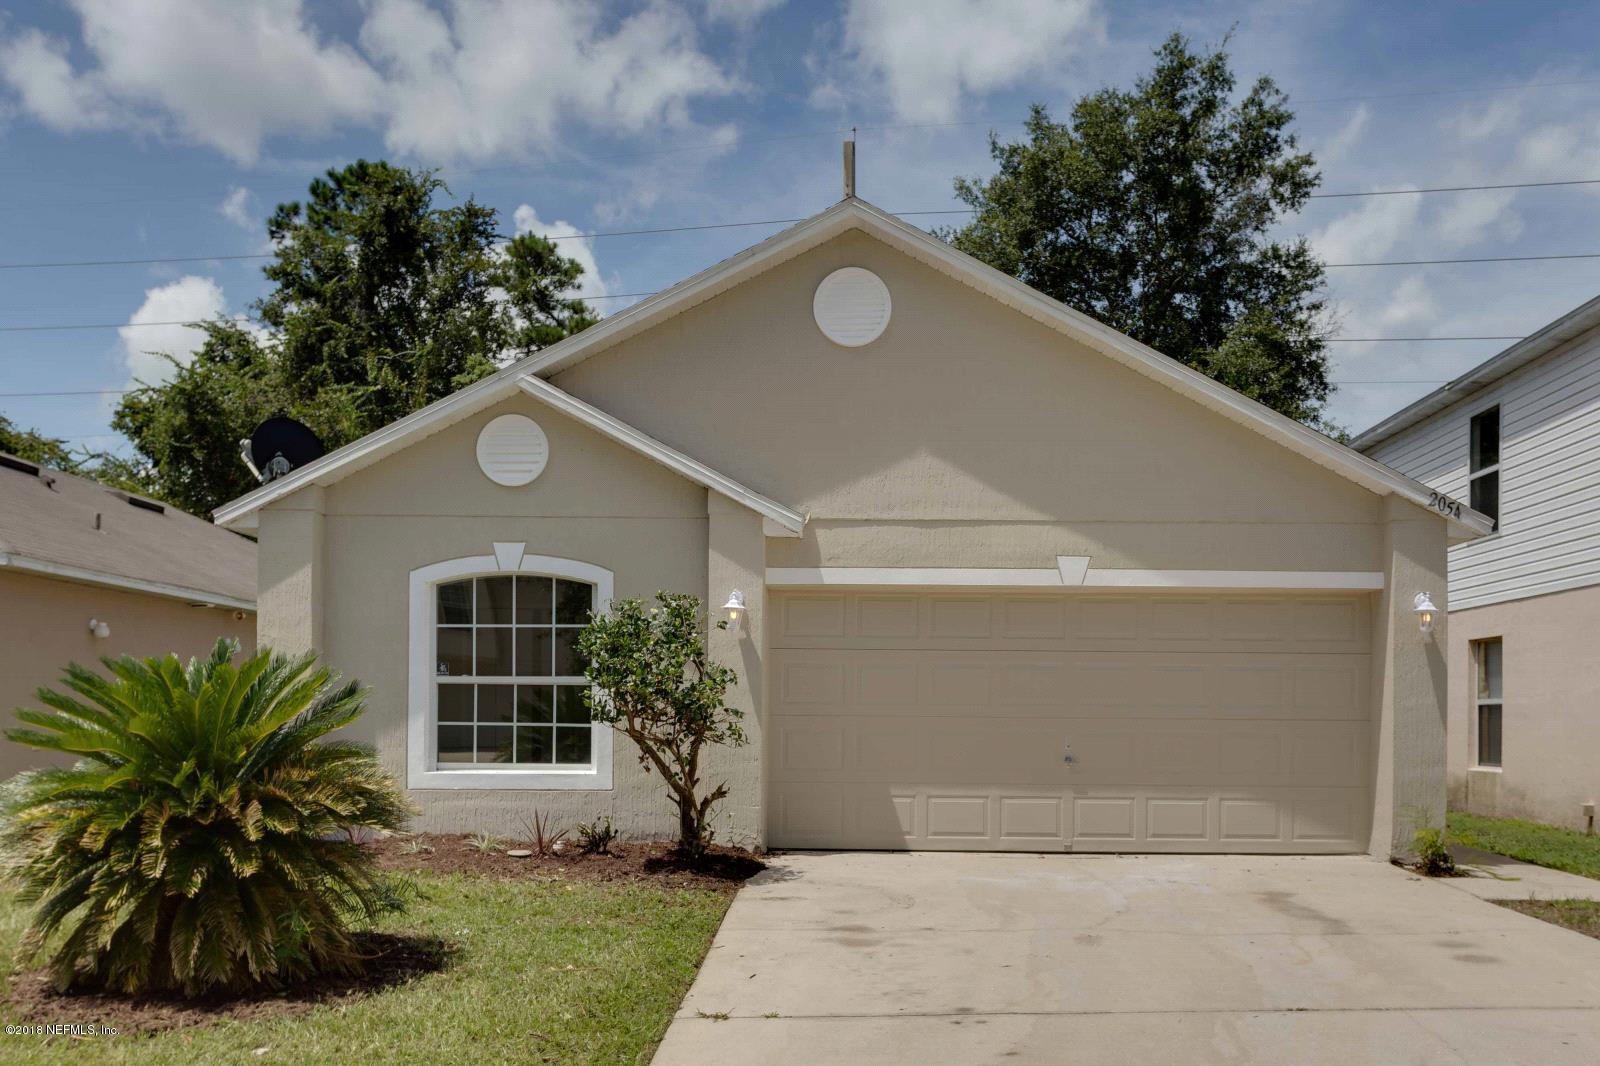 2054 WILEY OAKS, JACKSONVILLE, FLORIDA 32210, 3 Bedrooms Bedrooms, ,2 BathroomsBathrooms,Residential - single family,For sale,WILEY OAKS,963272